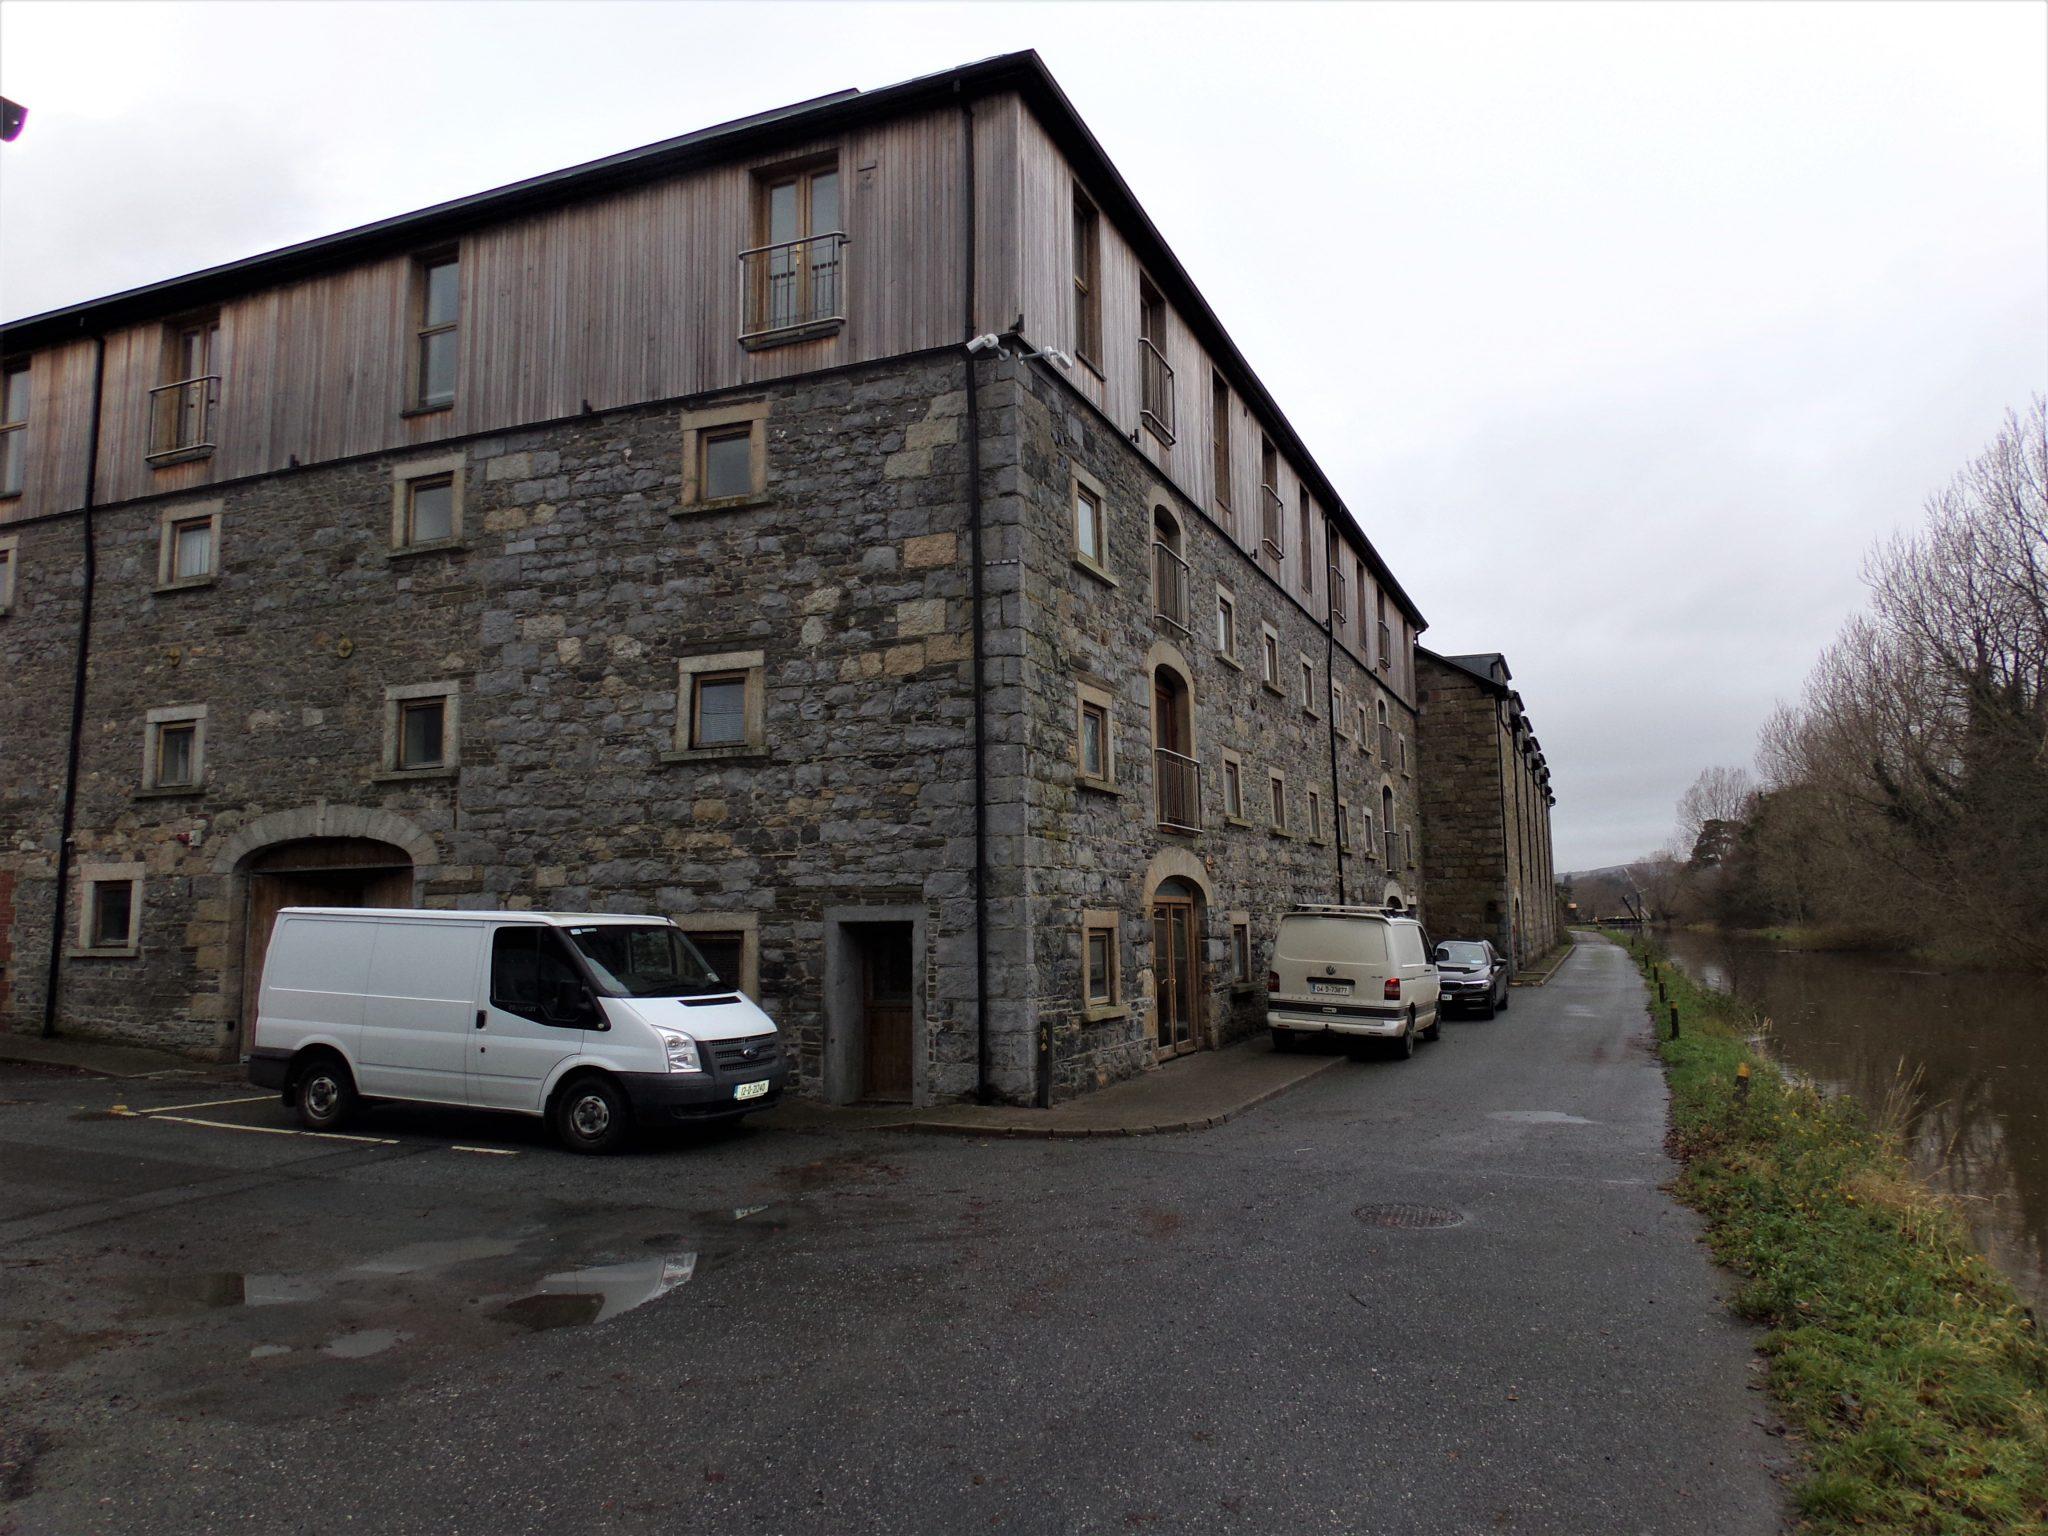 Grainstore, Singletons Lane, Bagenalstown, Co. Carlow